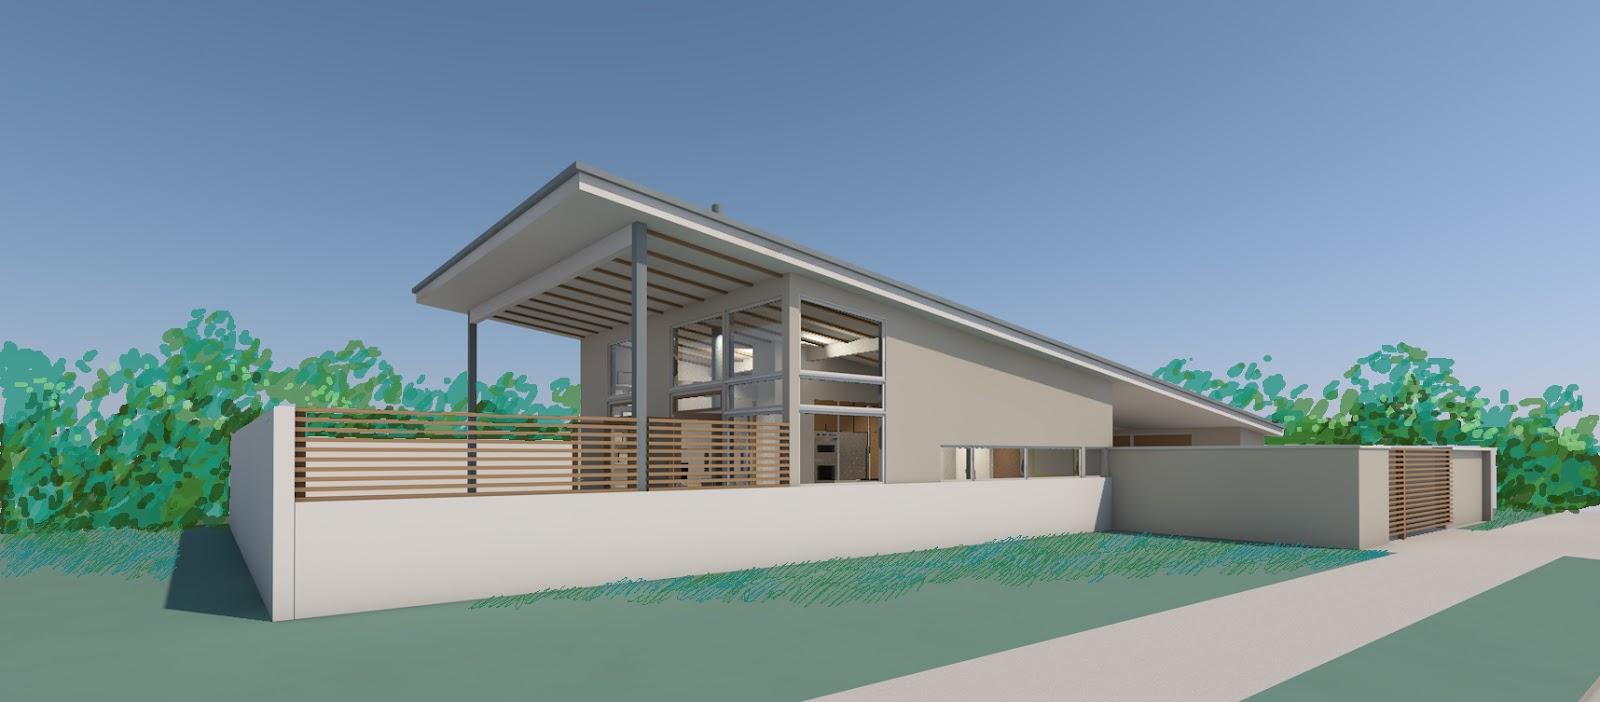 Mcm Design Minimum House Plan 2